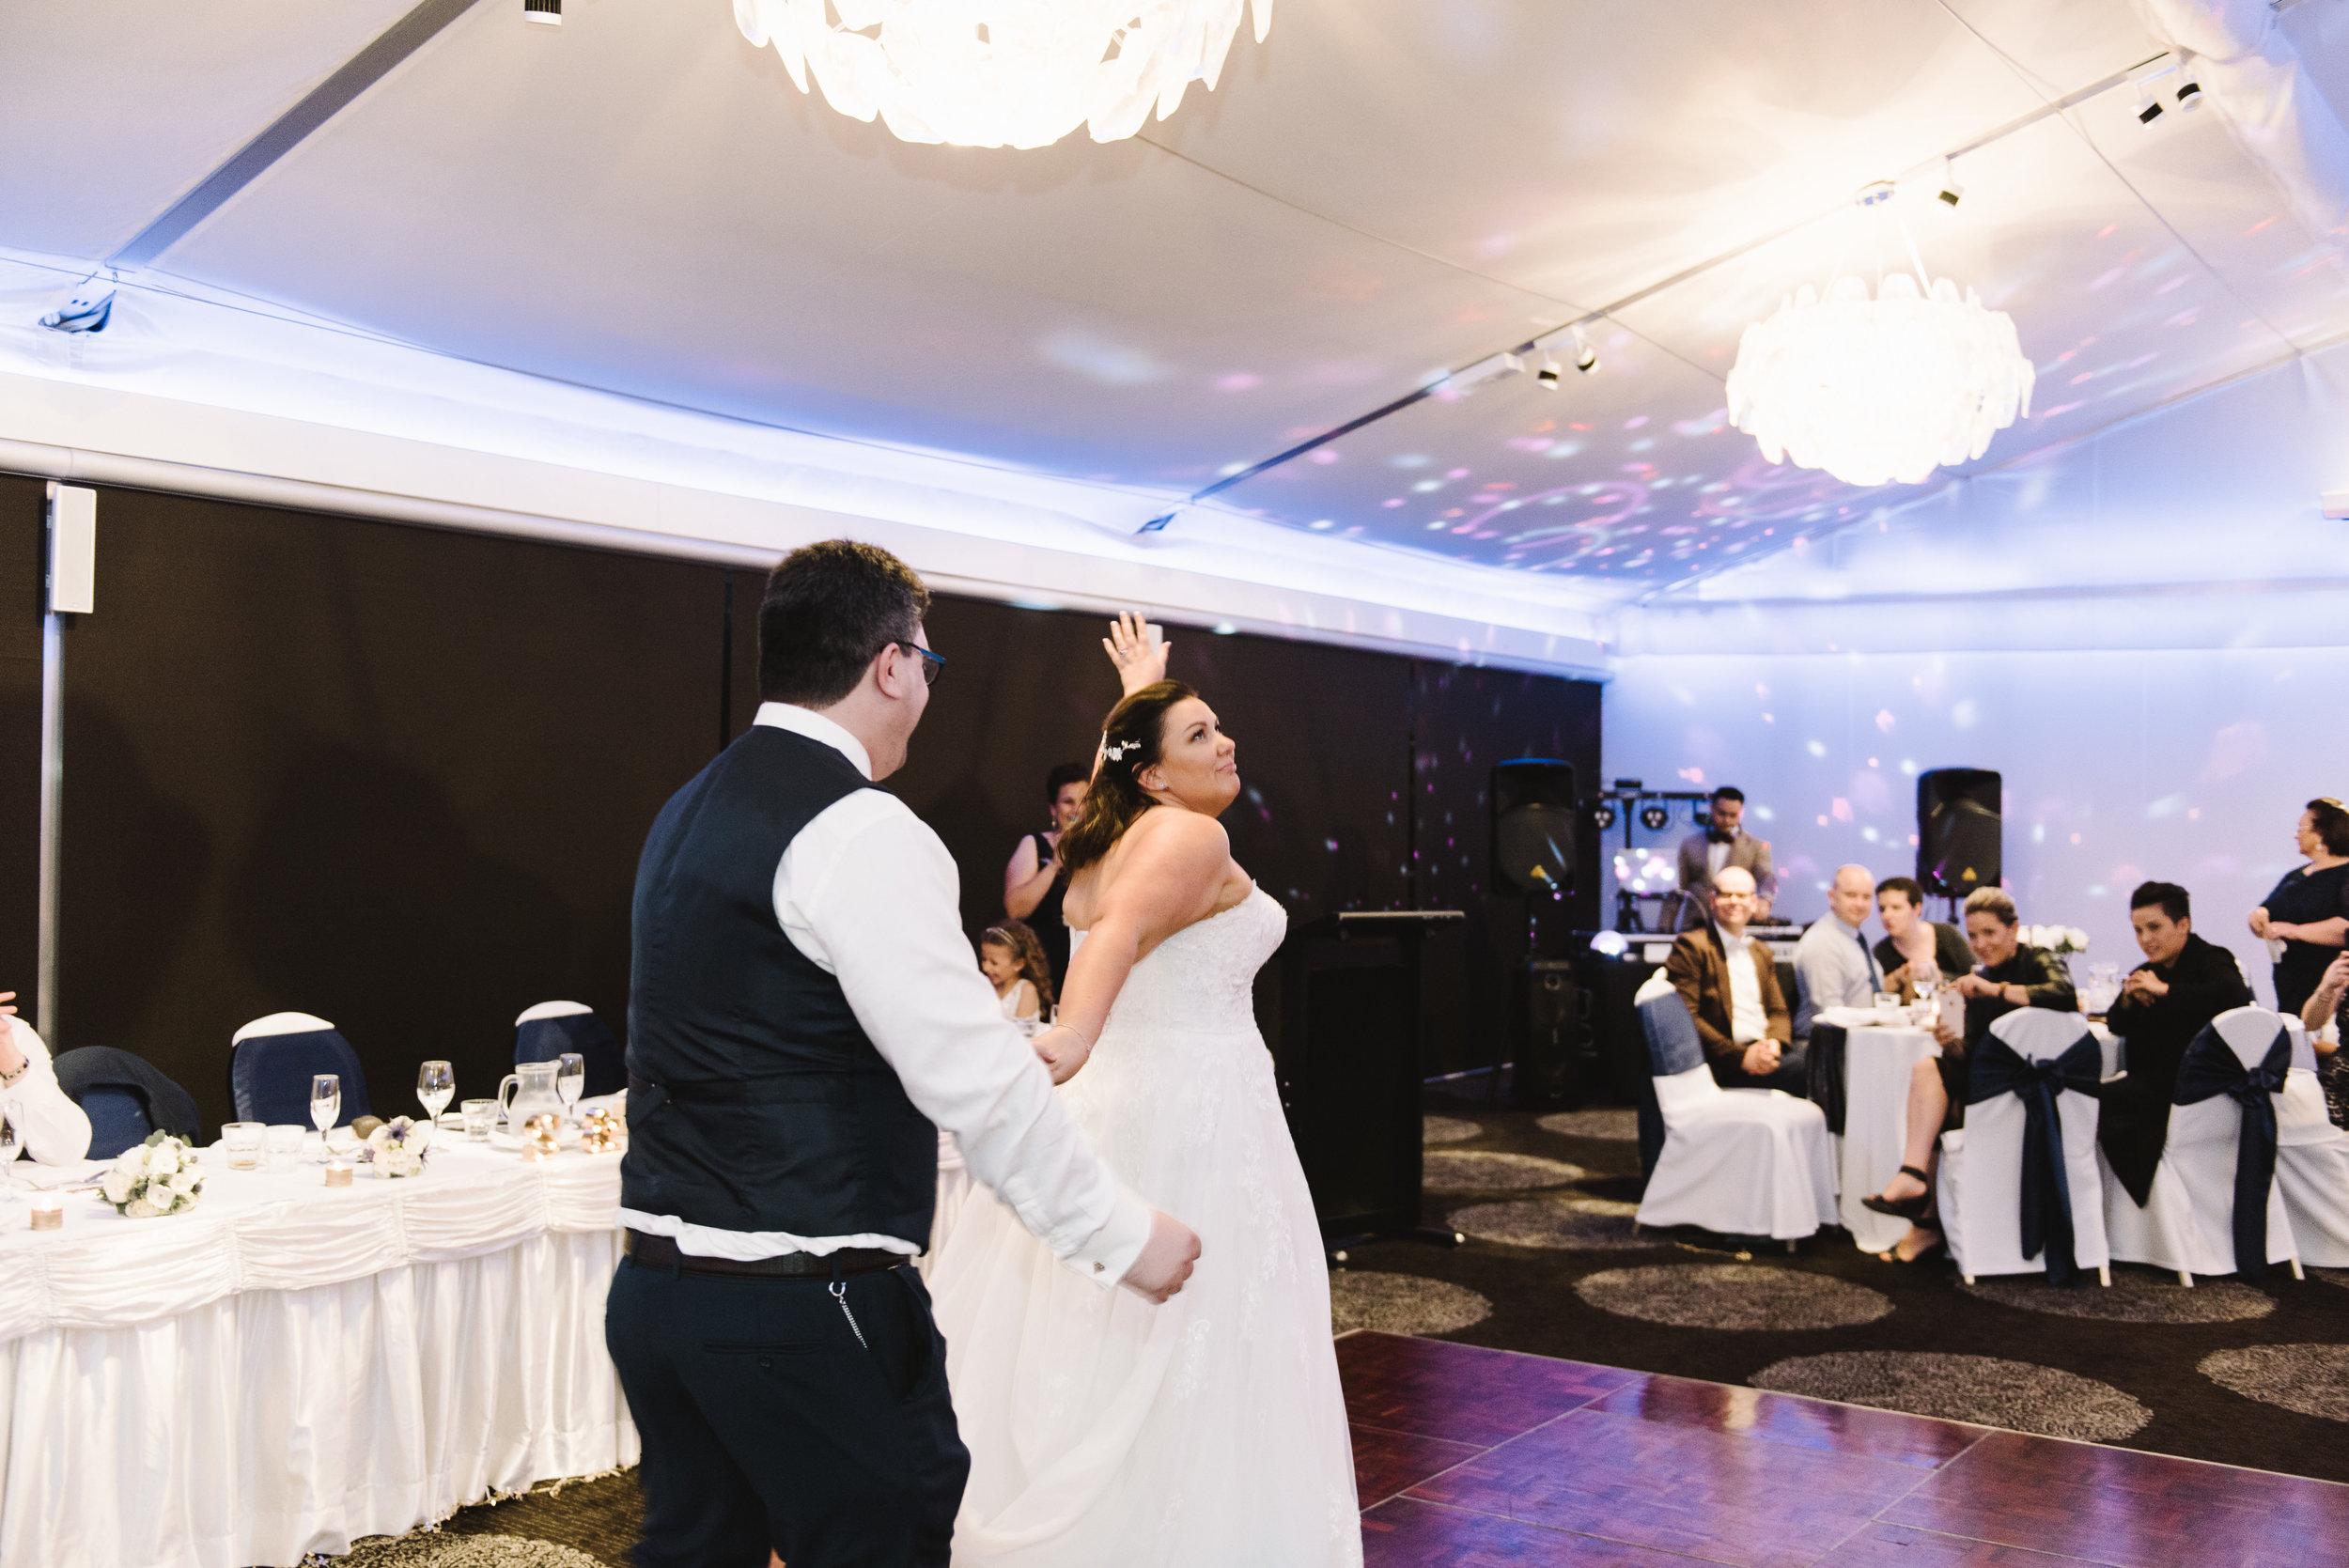 brisbane-wedding-photographer-121.jpg